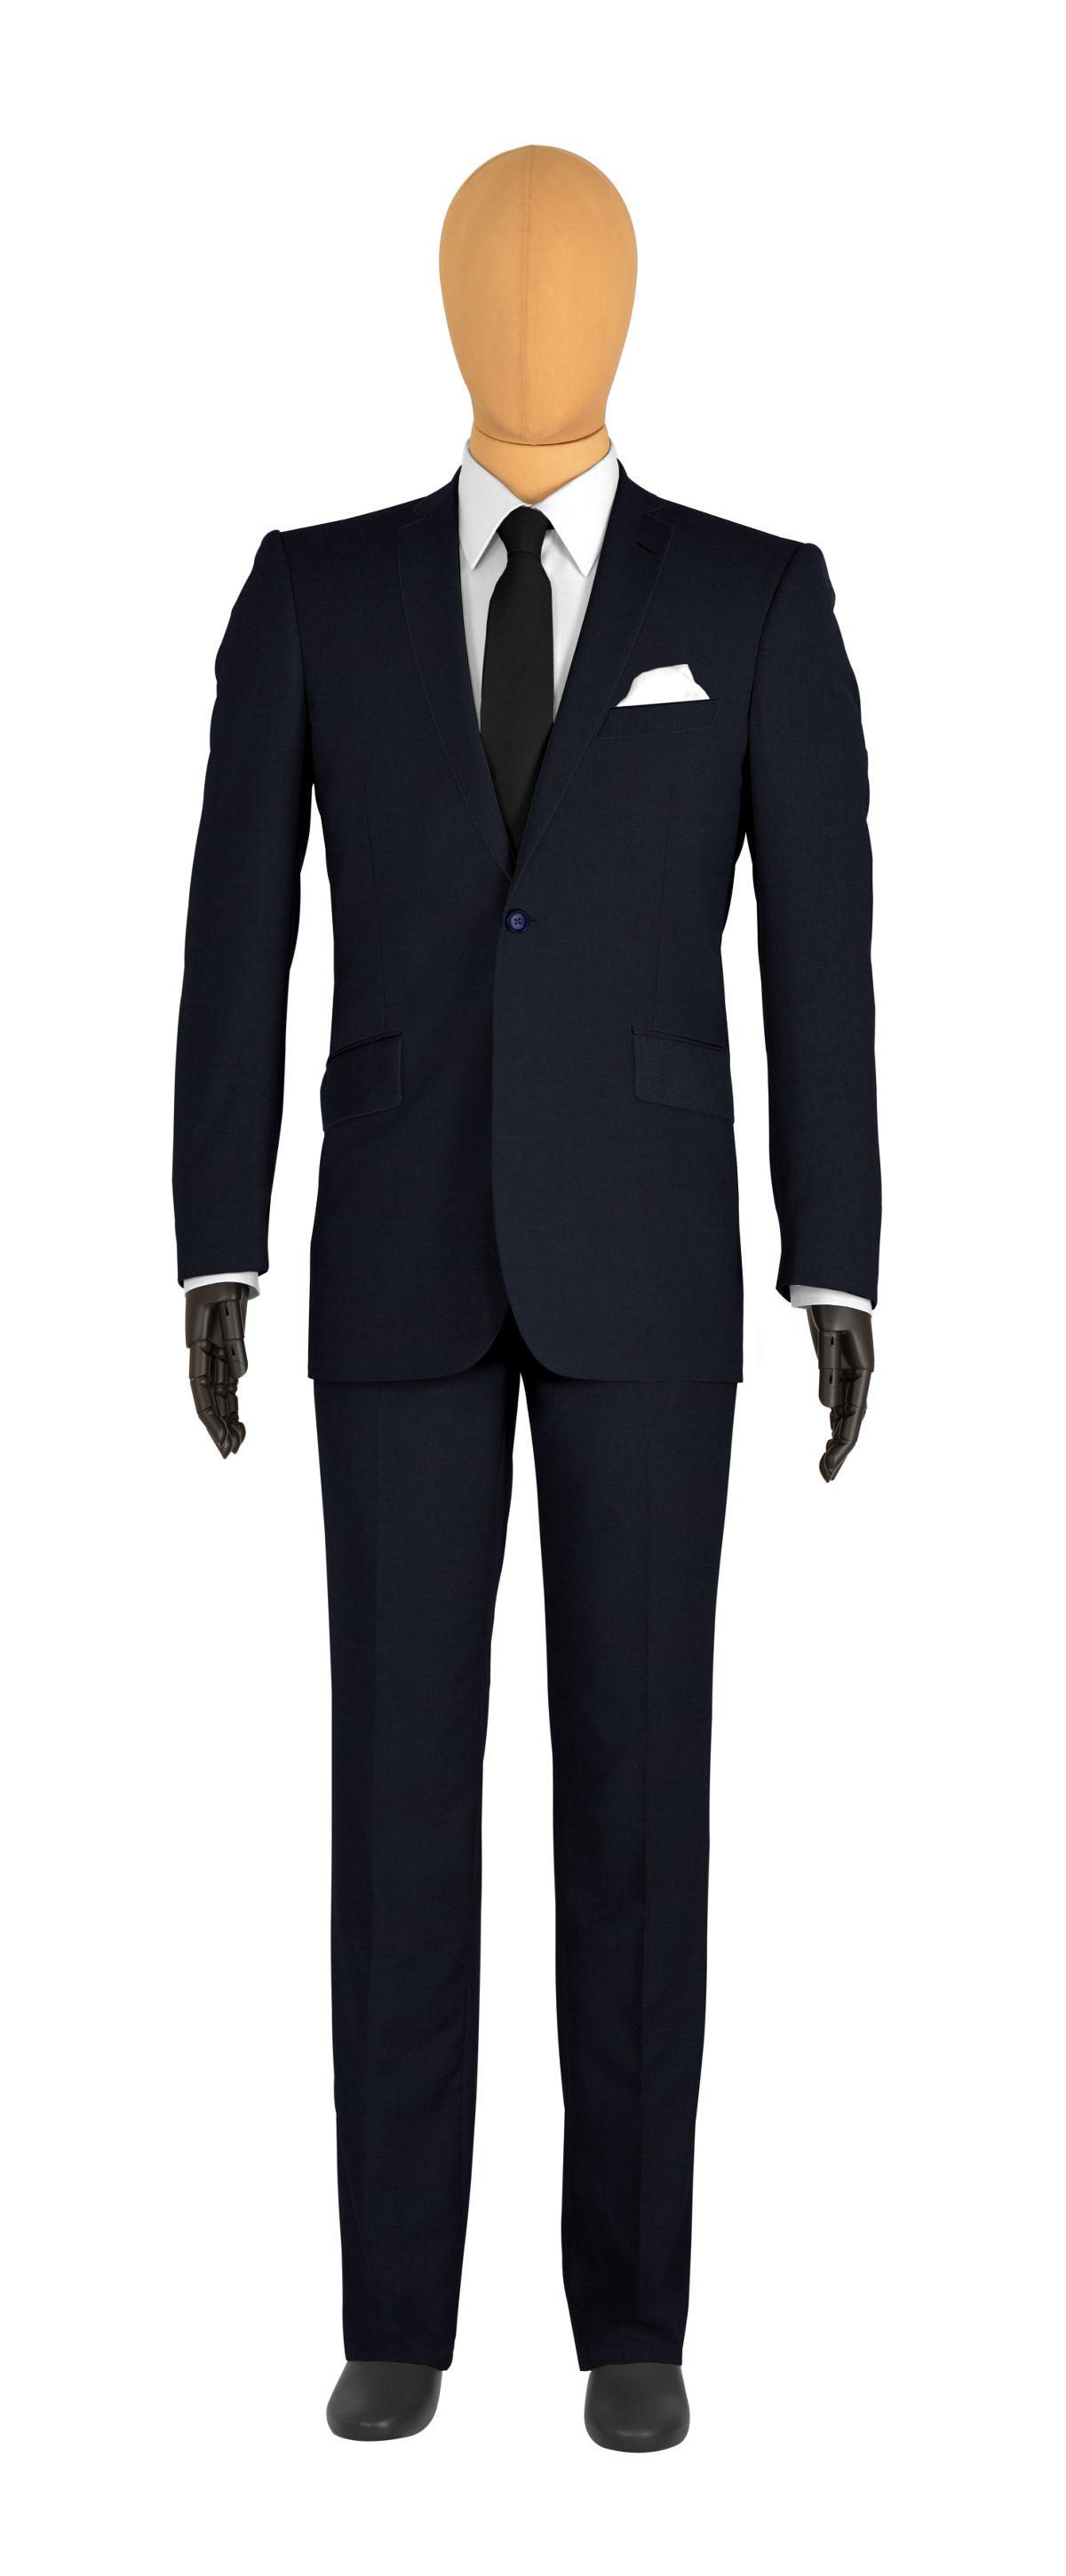 costume 1 bouton bleu doublure bleu ciel